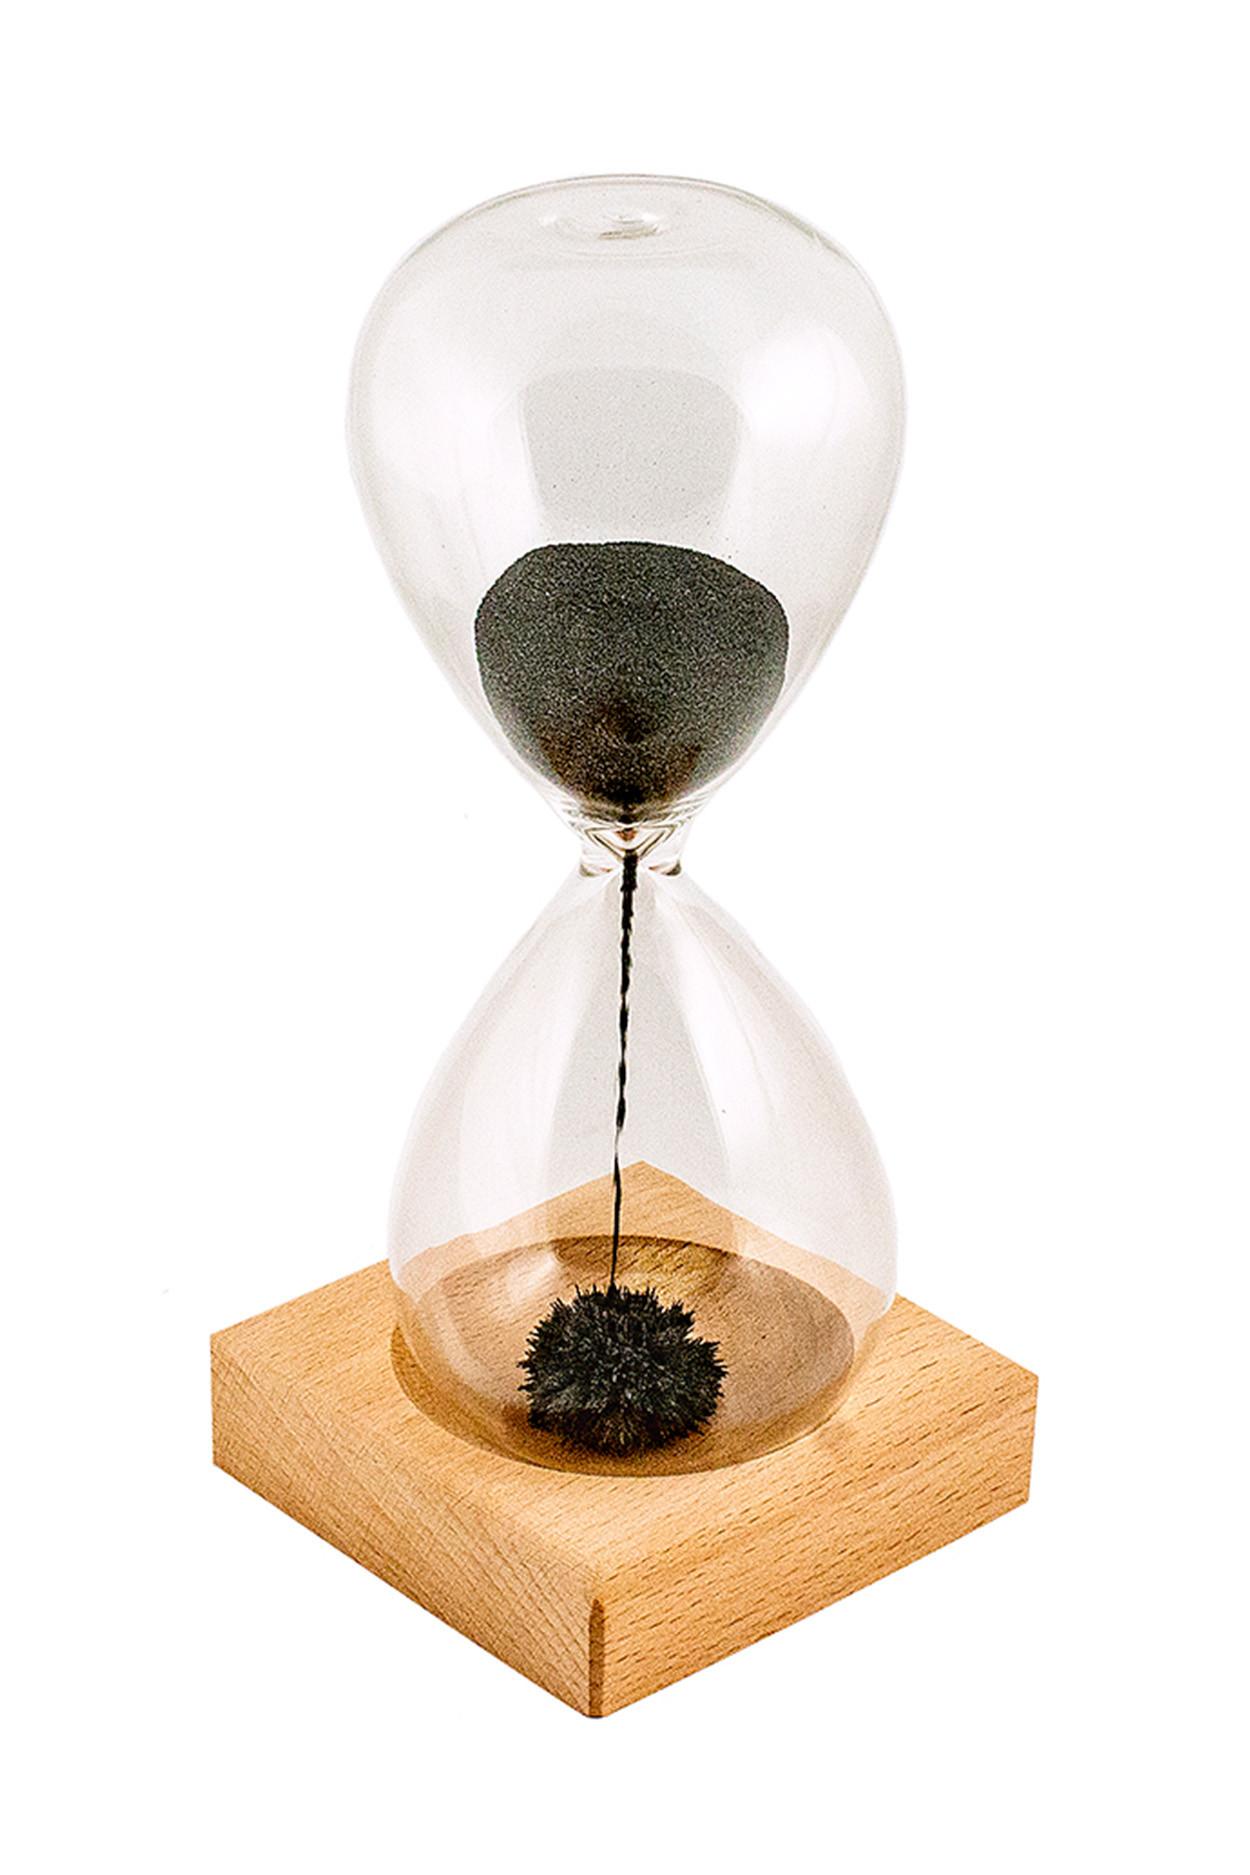 Магнитные песочные часы «Magnetic miracle» (16,5 х 6 см)